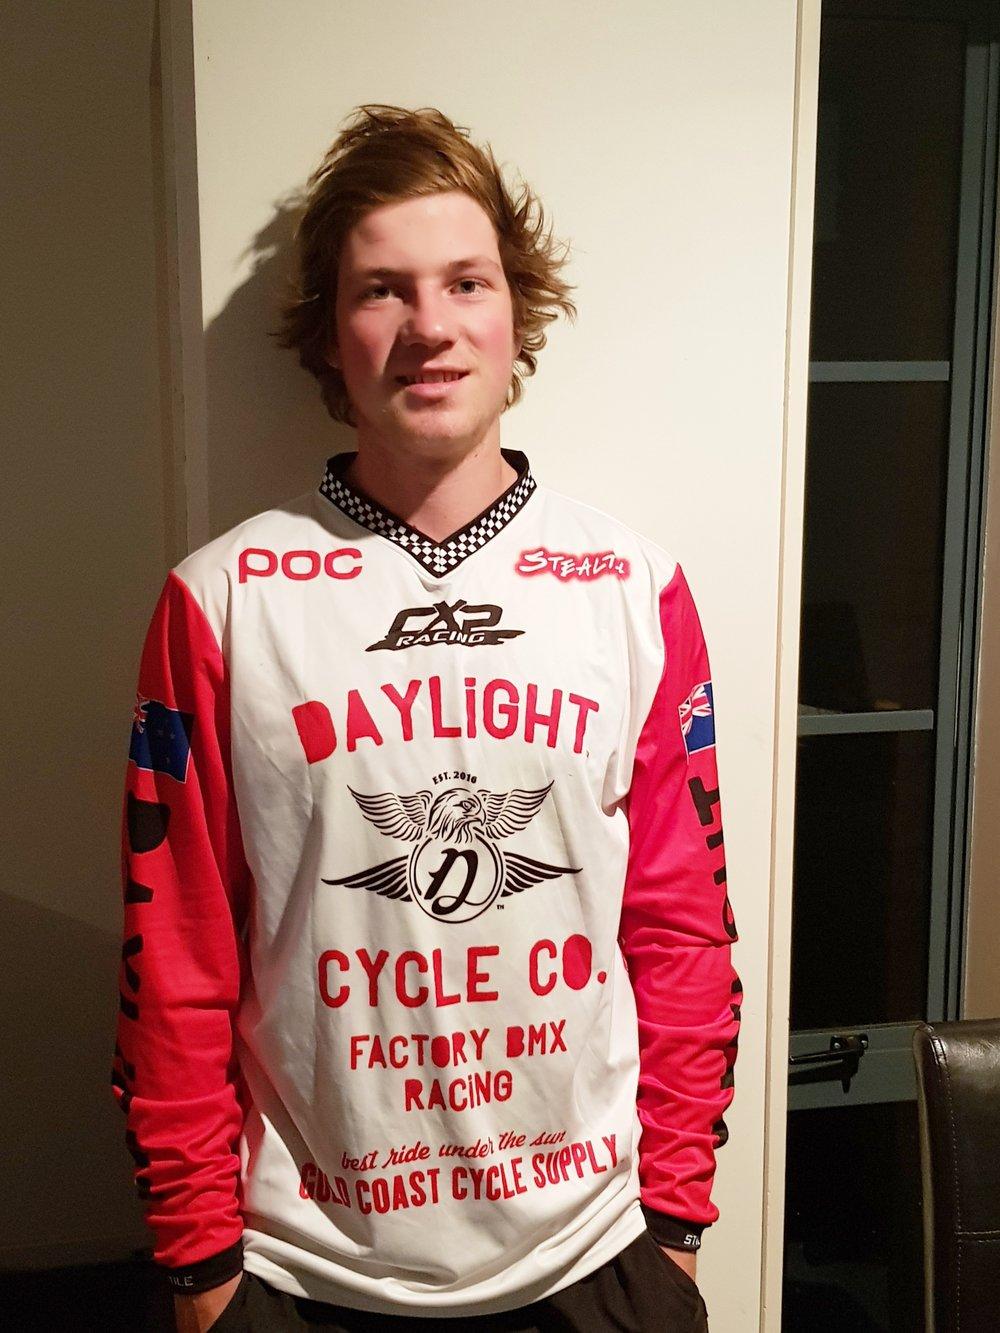 daylight bayleigh rees 1.jpeg